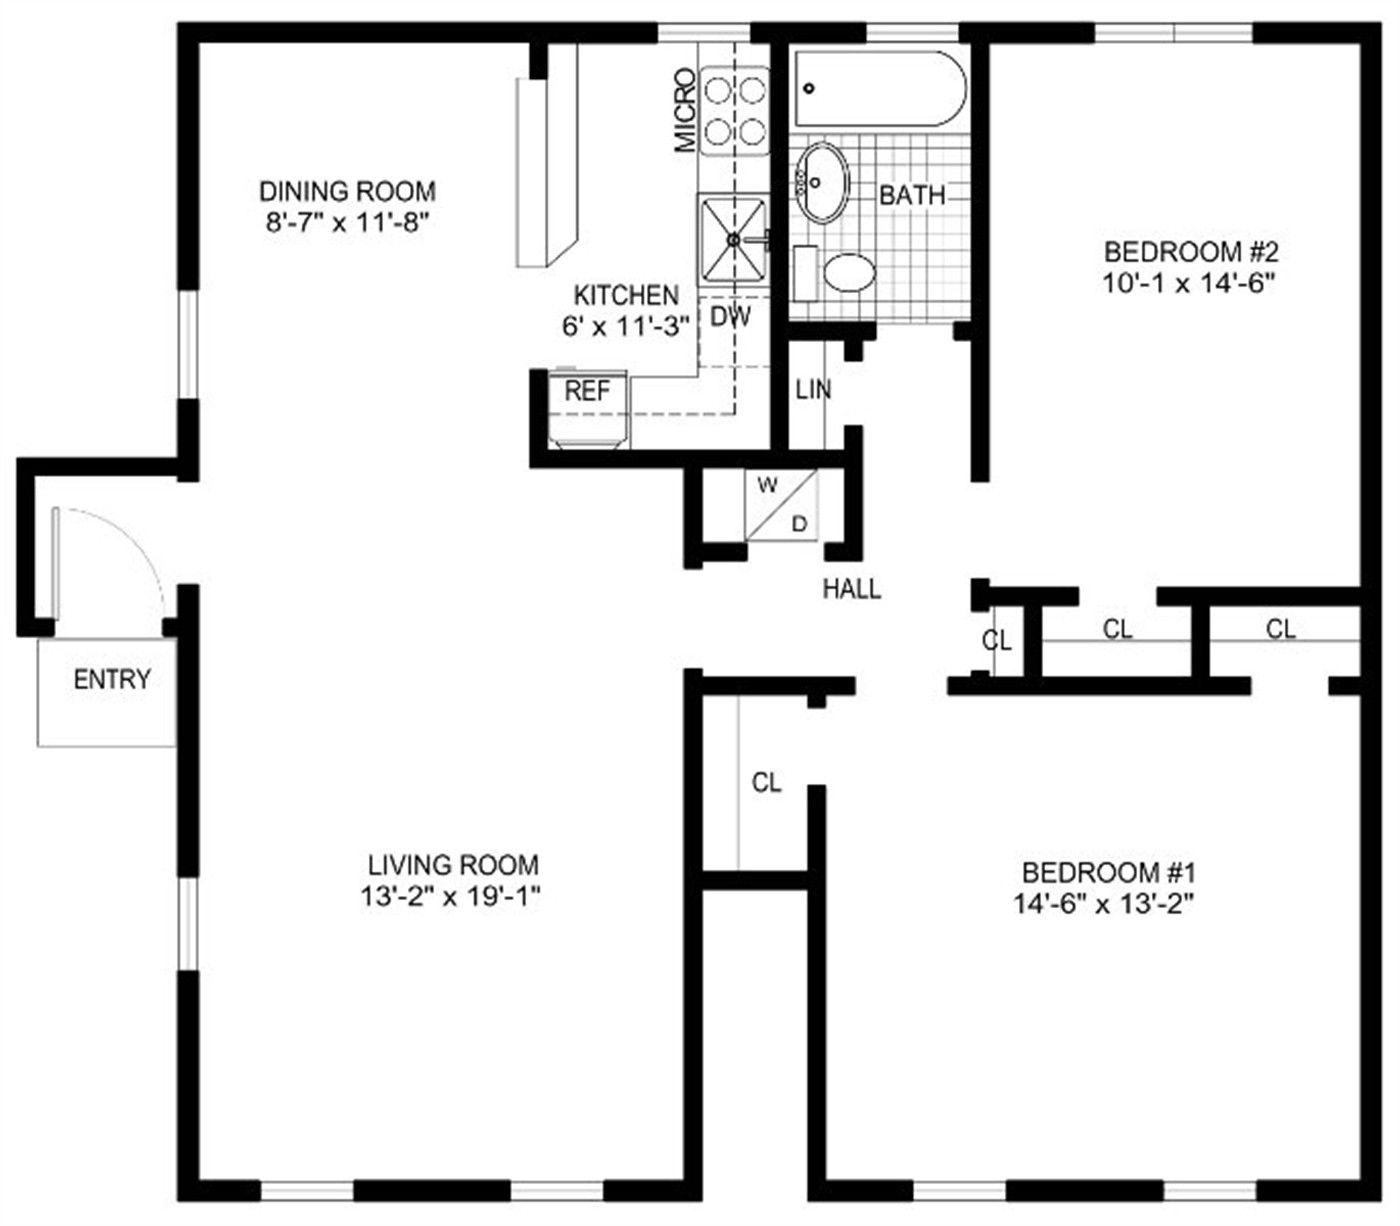 Free Floorplan Template Beautiful Woodwork Free Printable Furniture Templates For Floor Free Floor Plans Floor Plan Design Floor Plan Layout Design a floor plan template